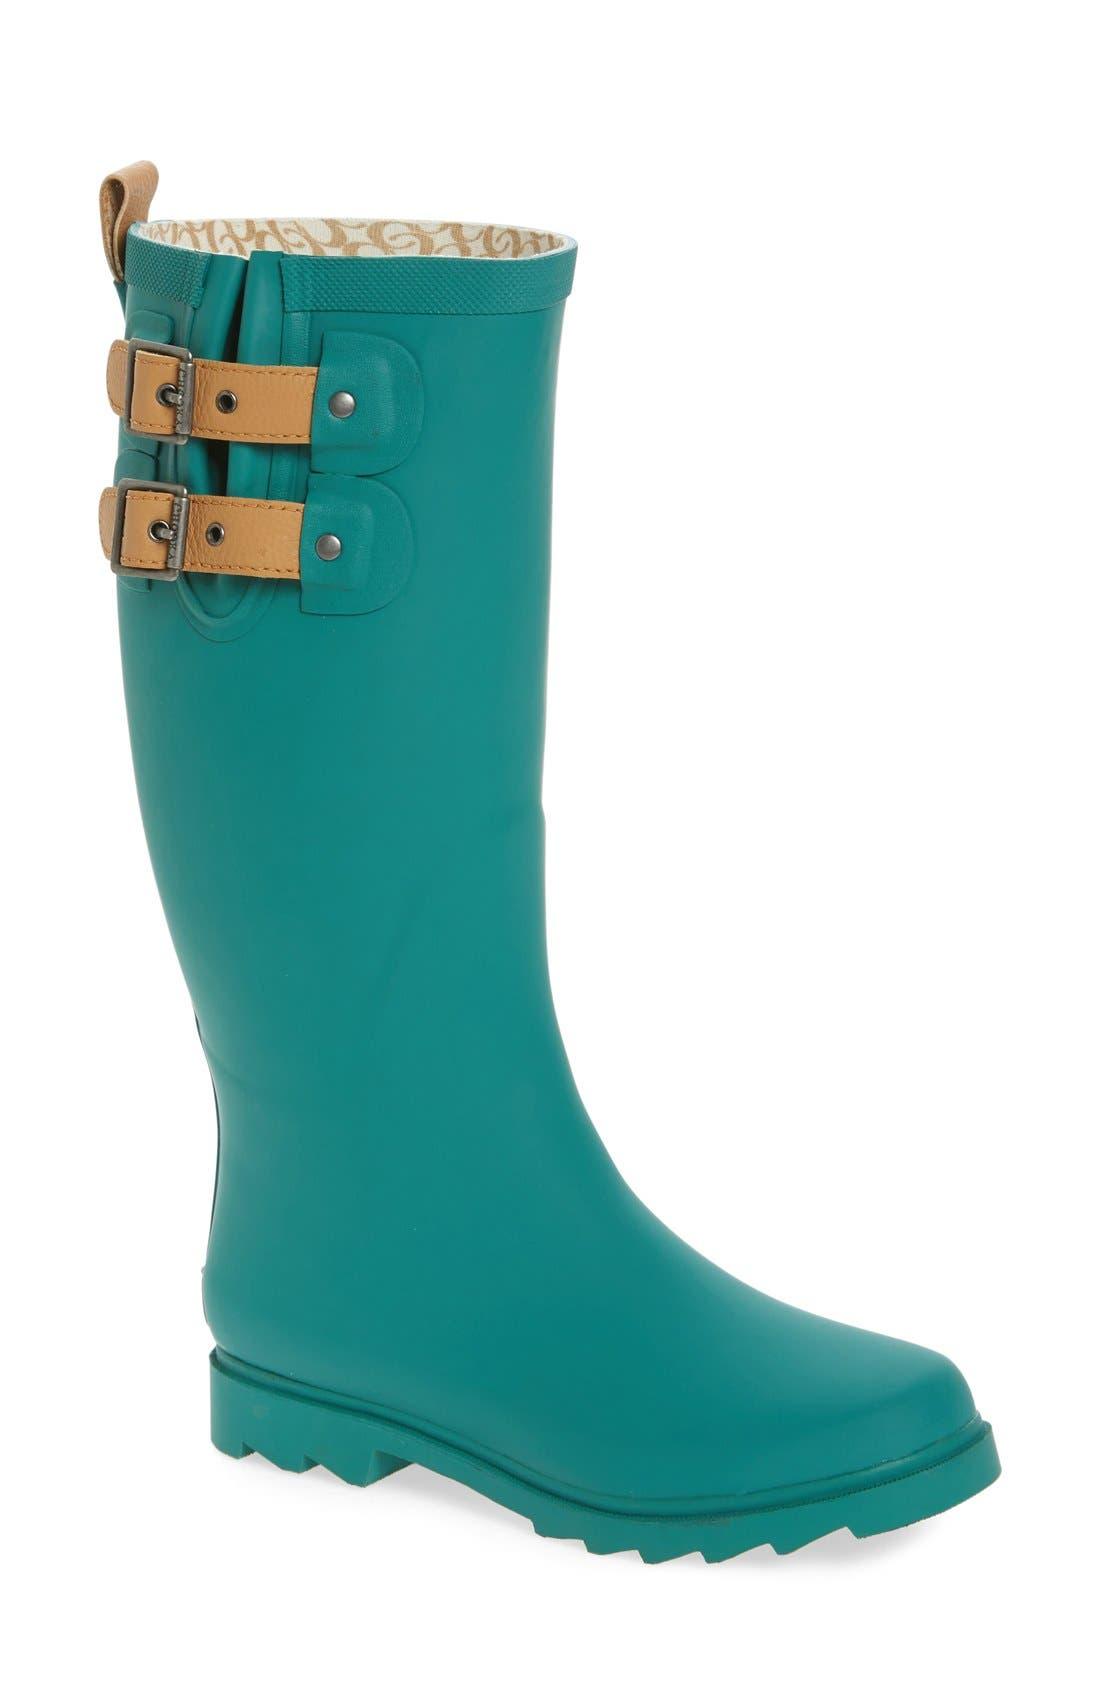 Main Image - Chooka 'Top Solid' Rain Boot (Women)